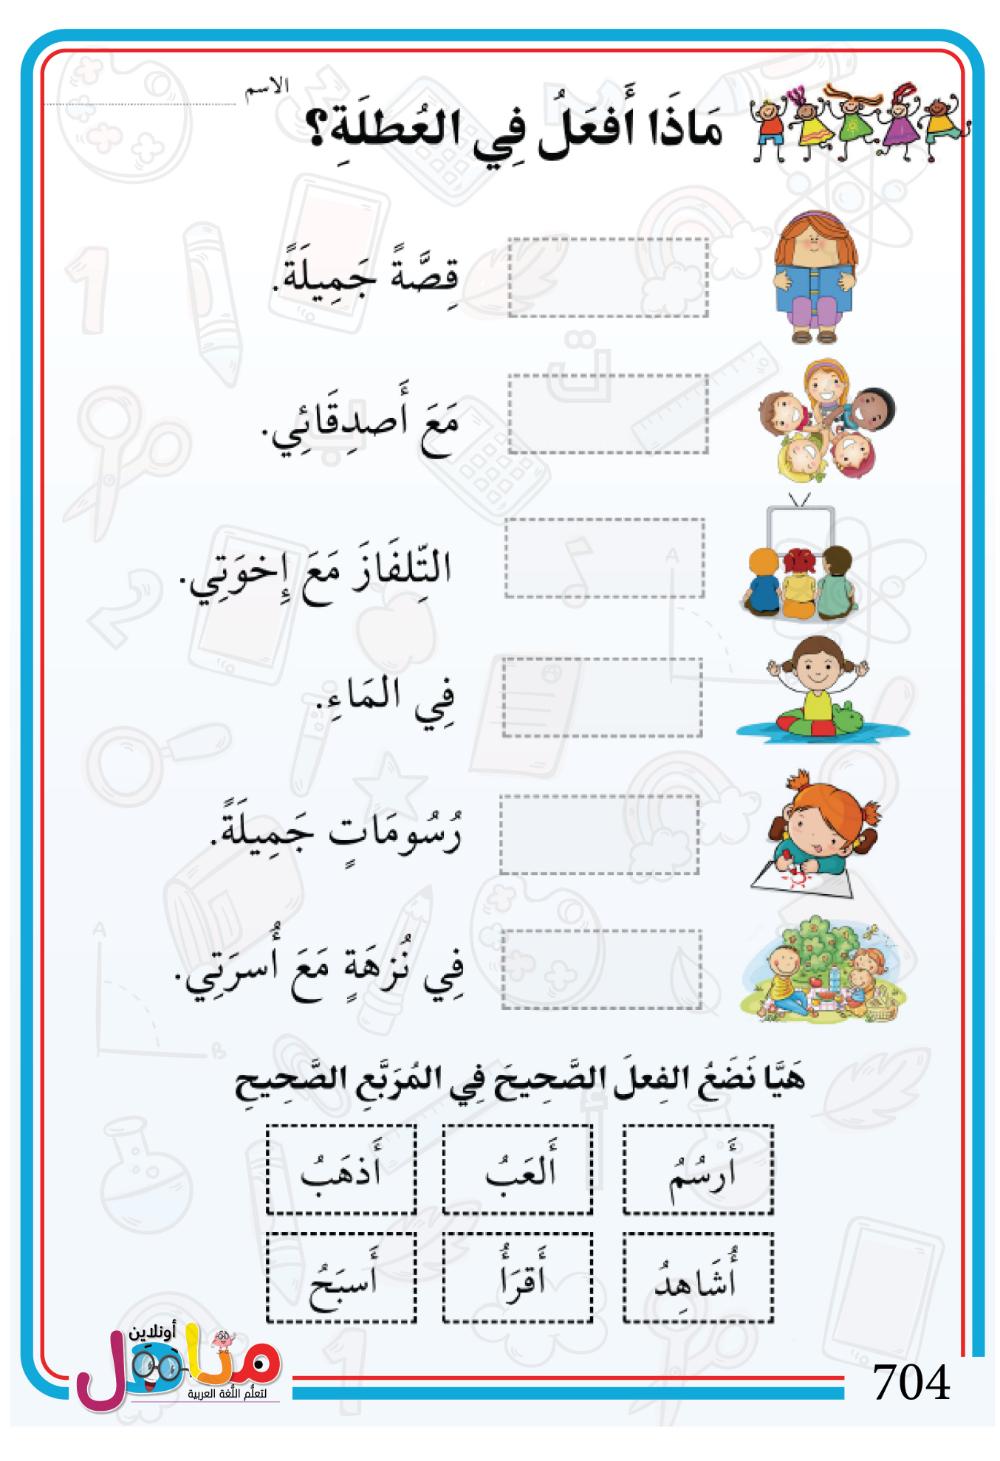 Mnahelonline تعلم اللغة العربية Learn Arabic Online Learn Arabic Online Learning Arabic Worksheets For Kids